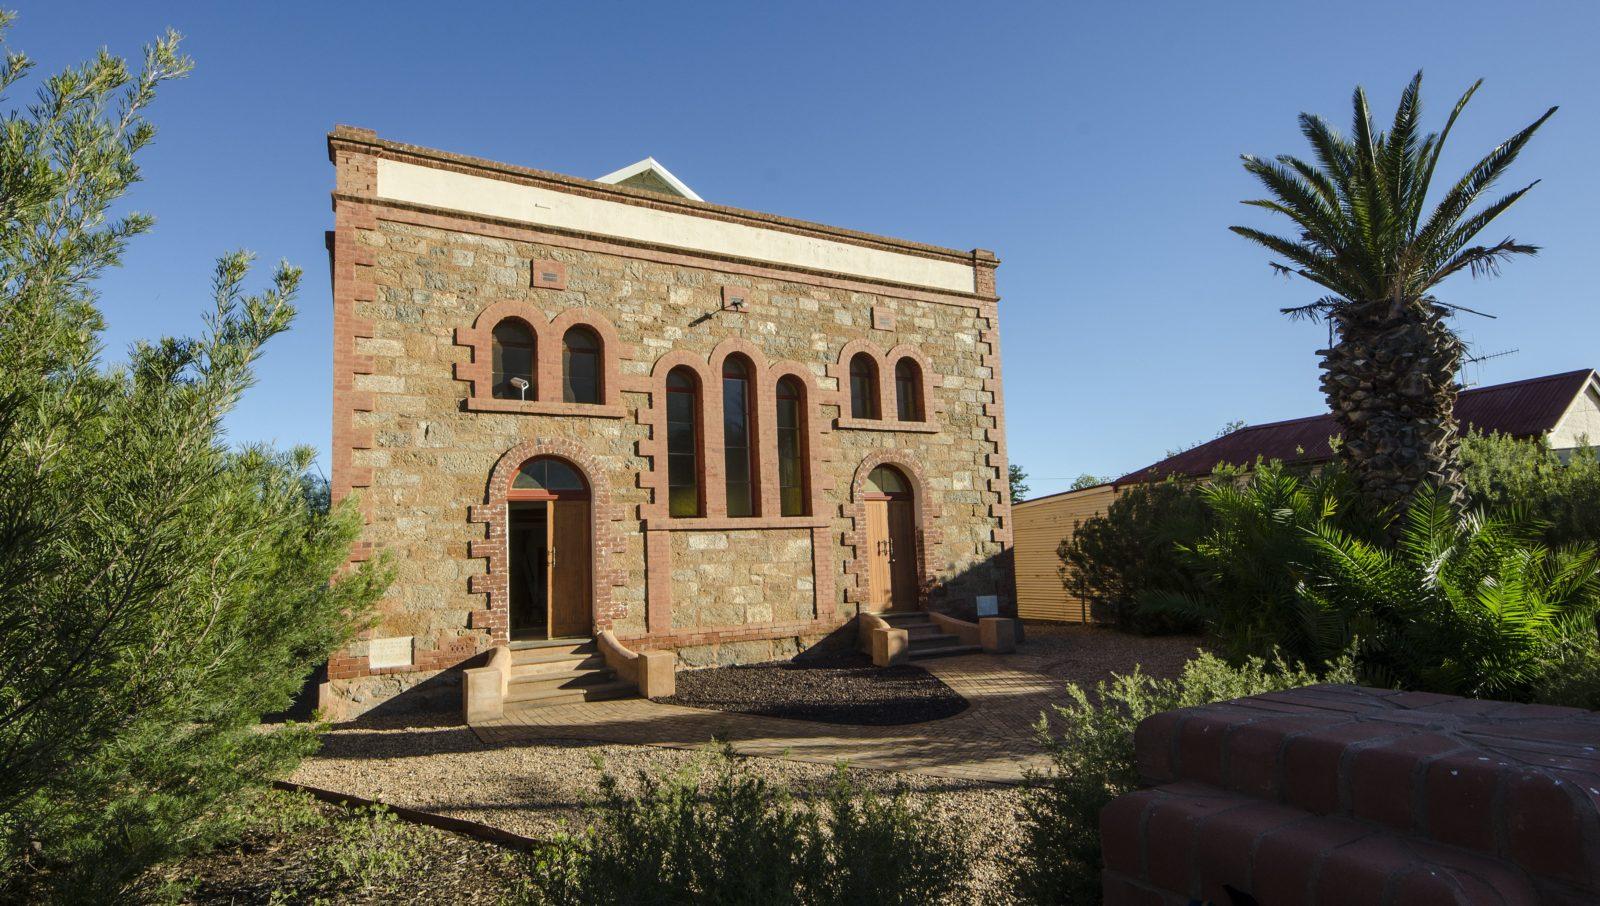 Original 1911 stone facade.